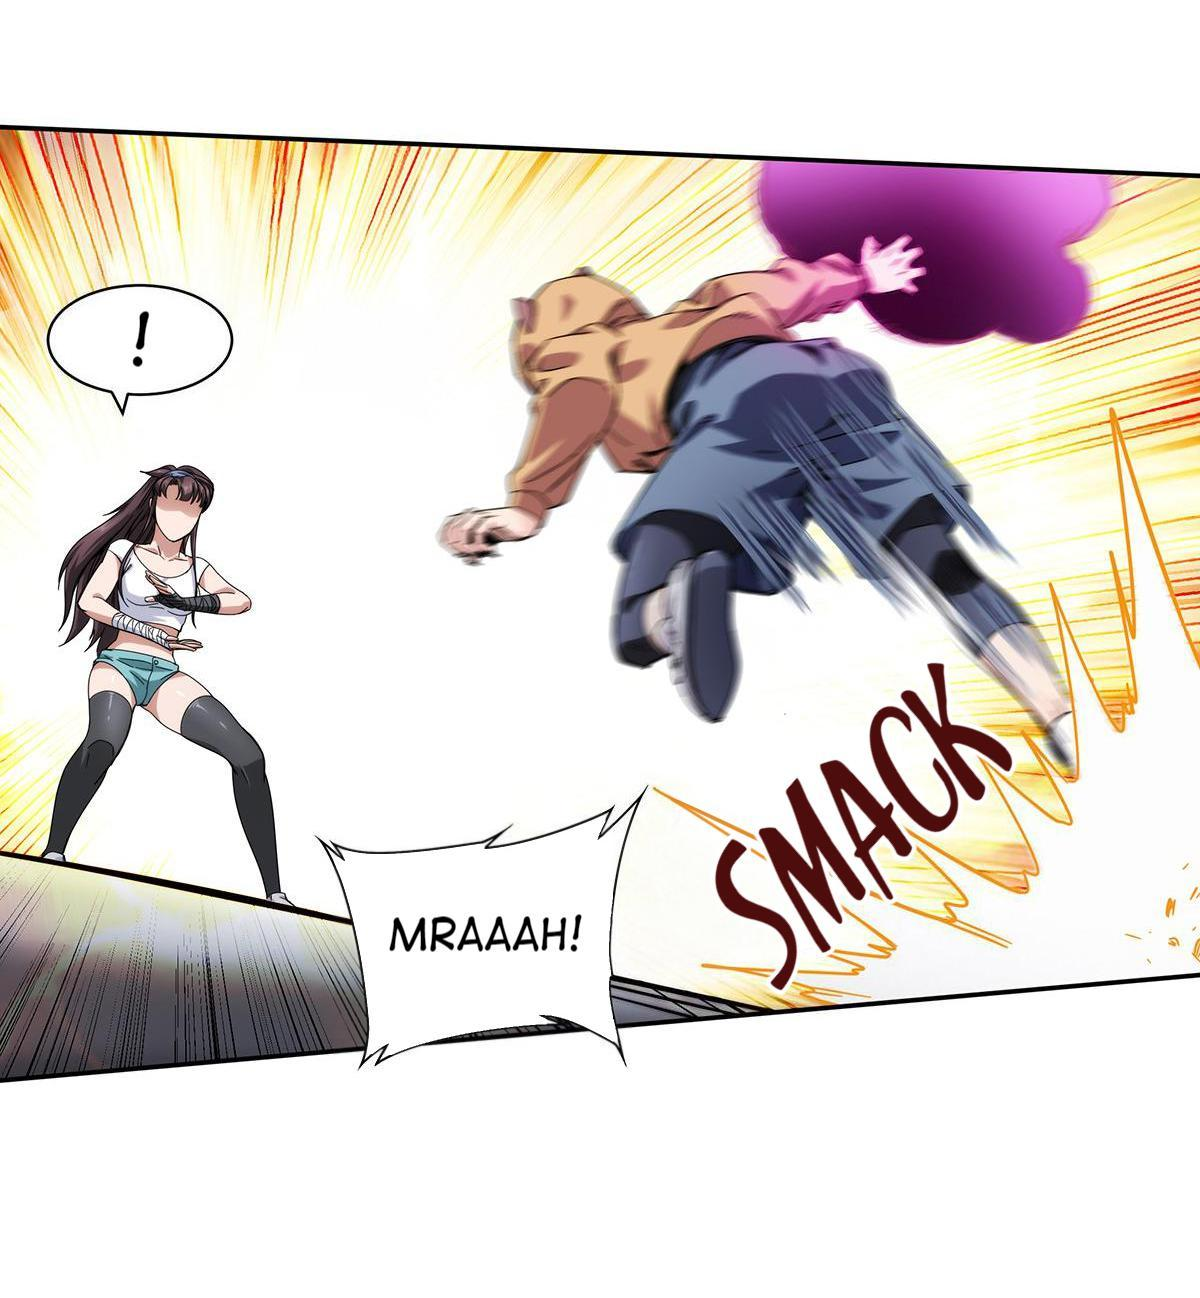 Handyman Saitou In Another World Chapter 26 page 2 - Mangakakalots.com